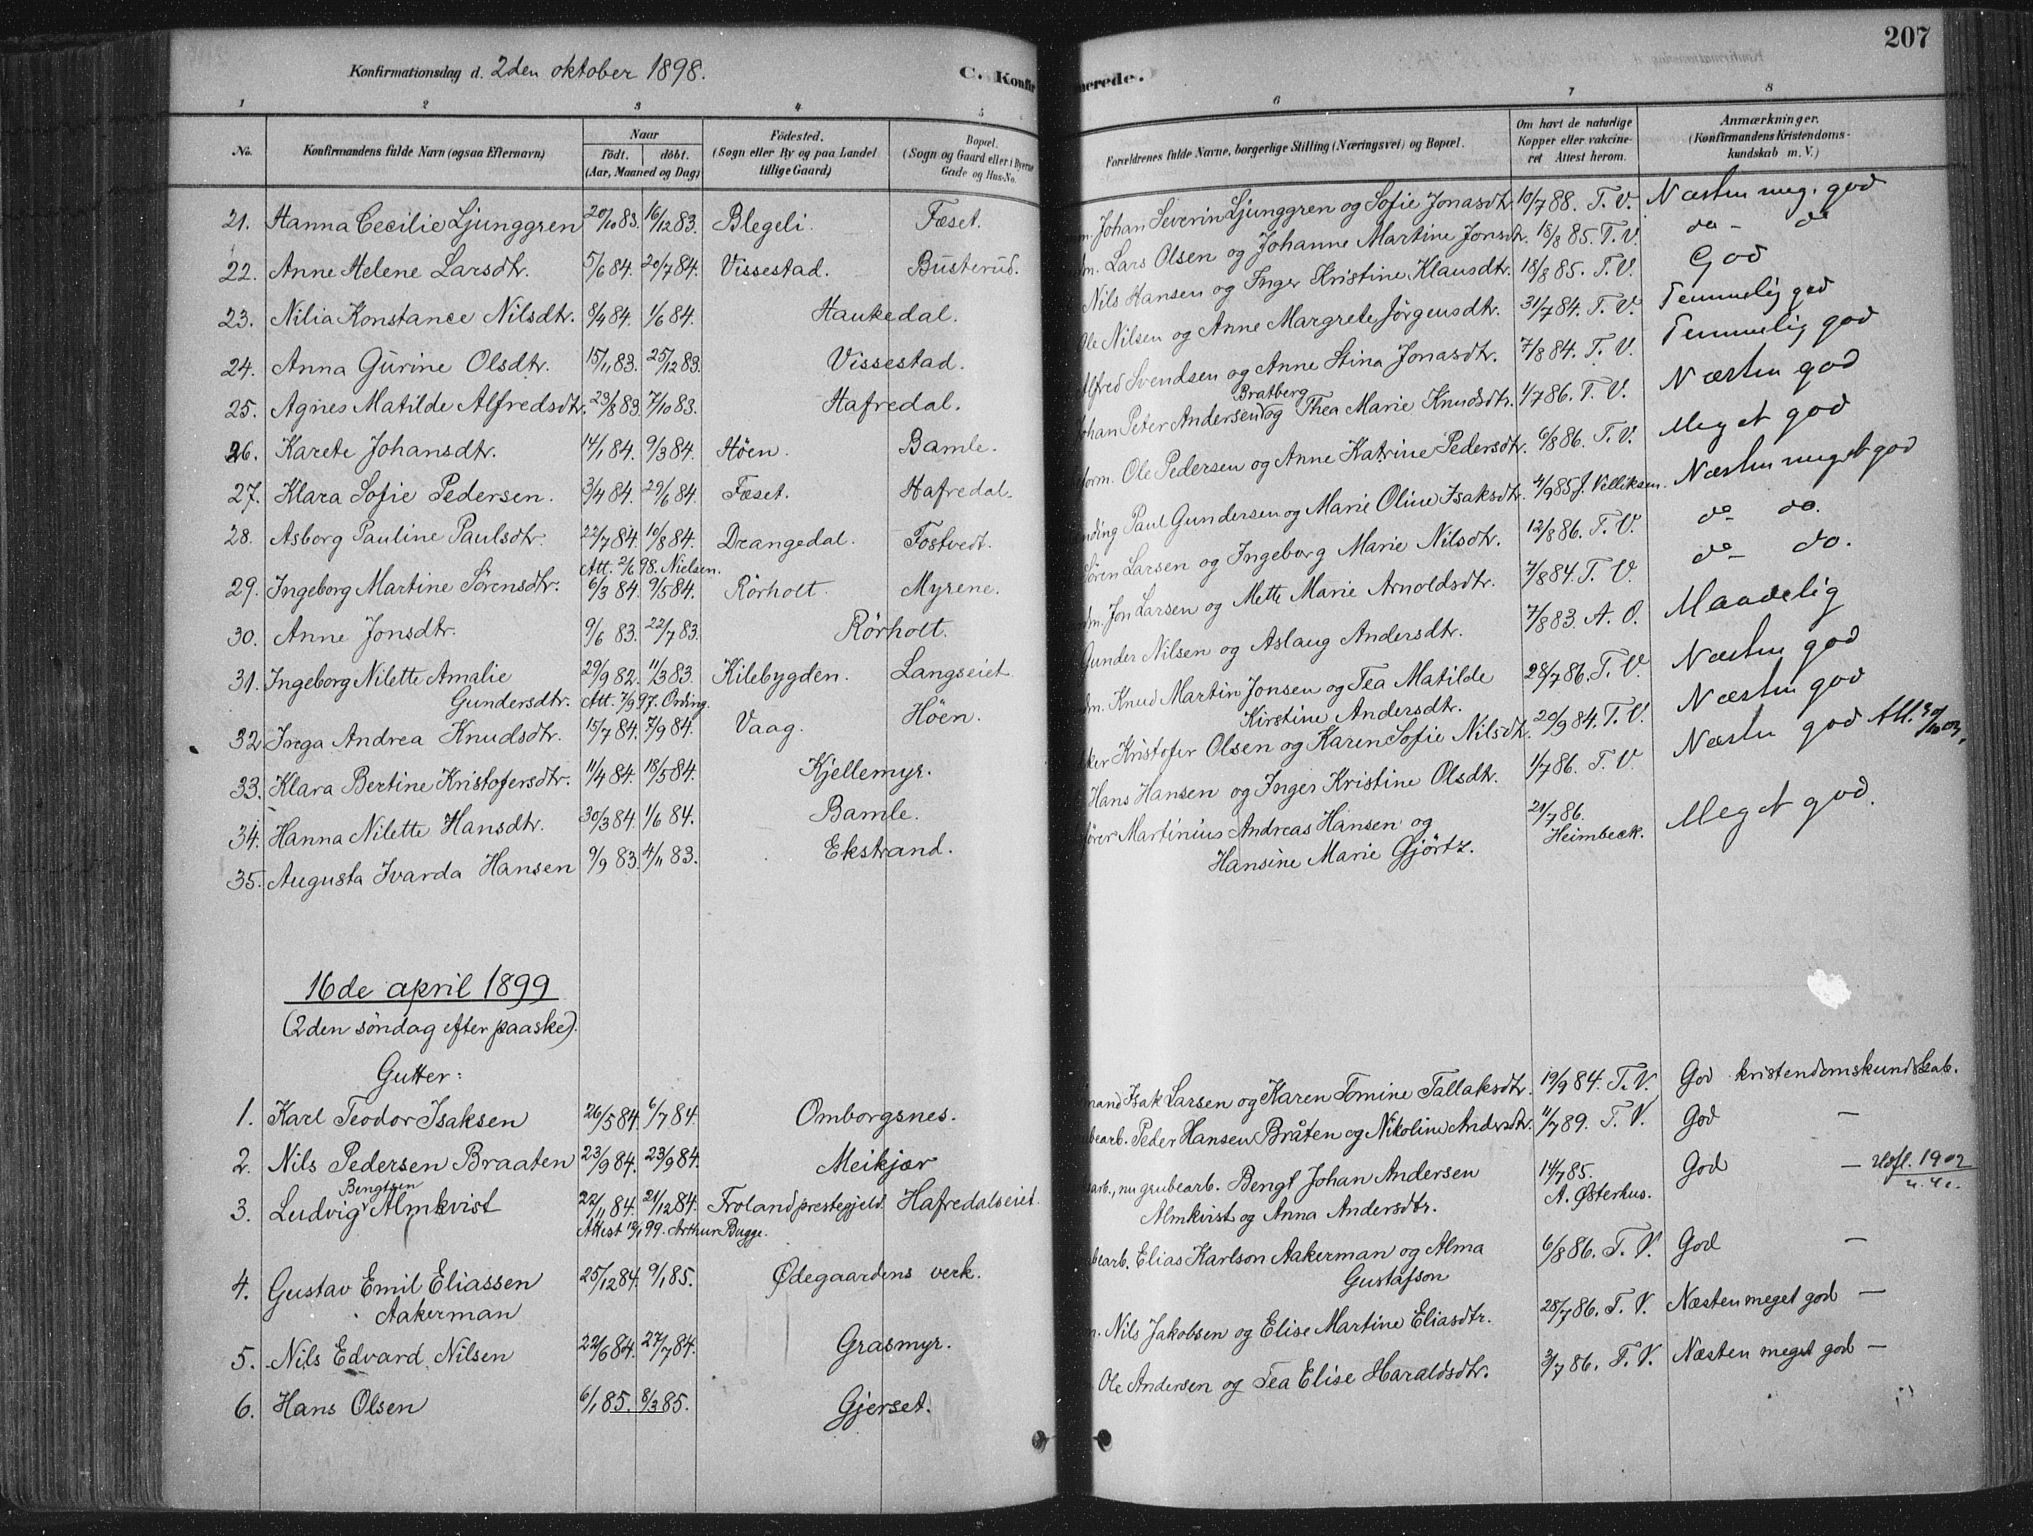 SAKO, Bamble kirkebøker, F/Fa/L0007: Ministerialbok nr. I 7, 1878-1888, s. 207